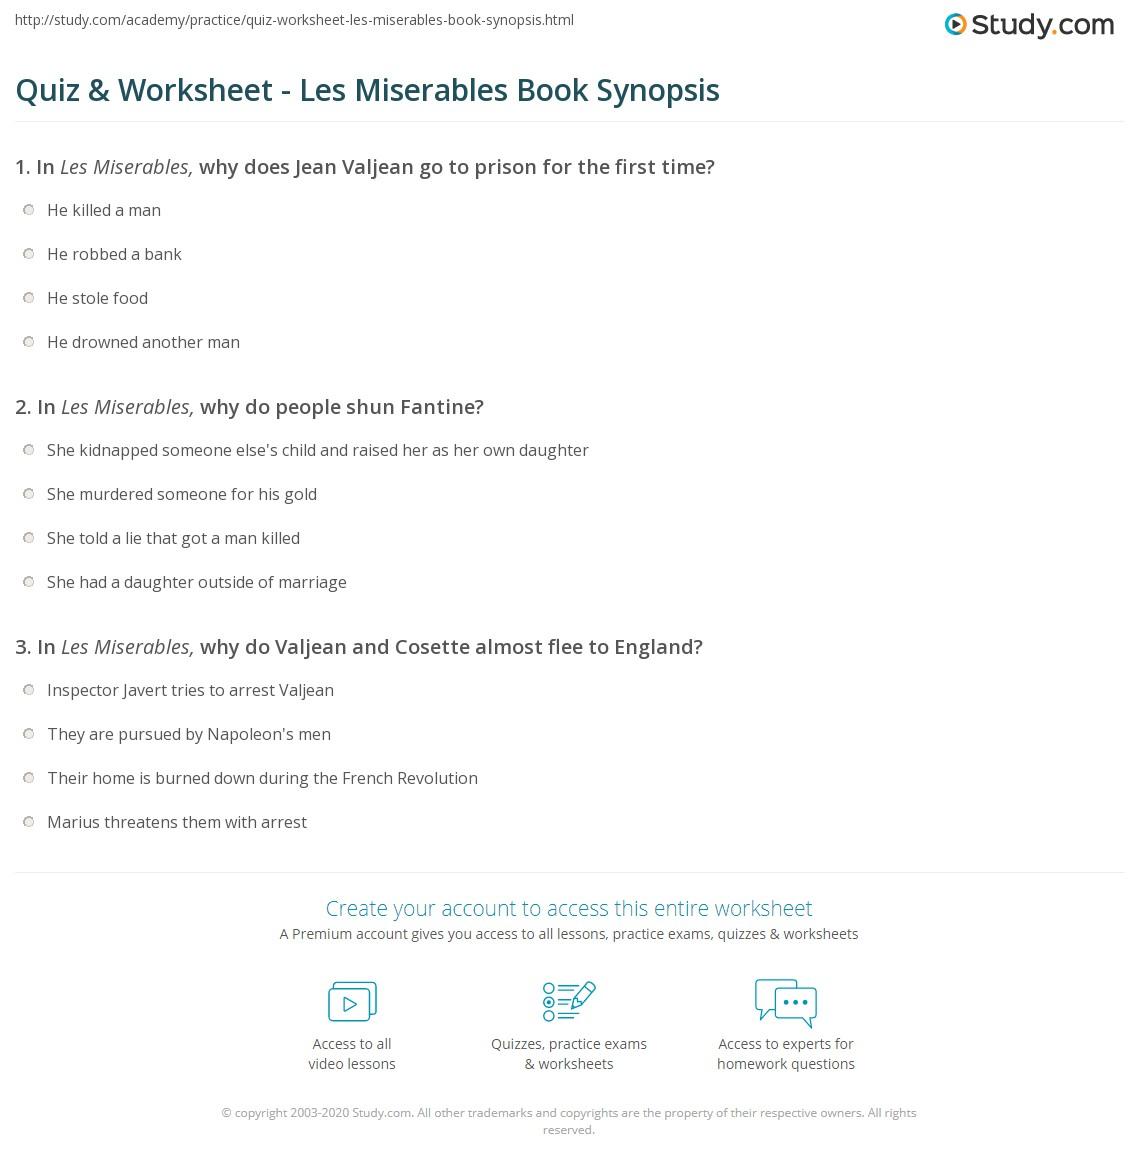 worksheet Les Miserables Worksheet quiz worksheet les miserables book synopsis study com print summary worksheet